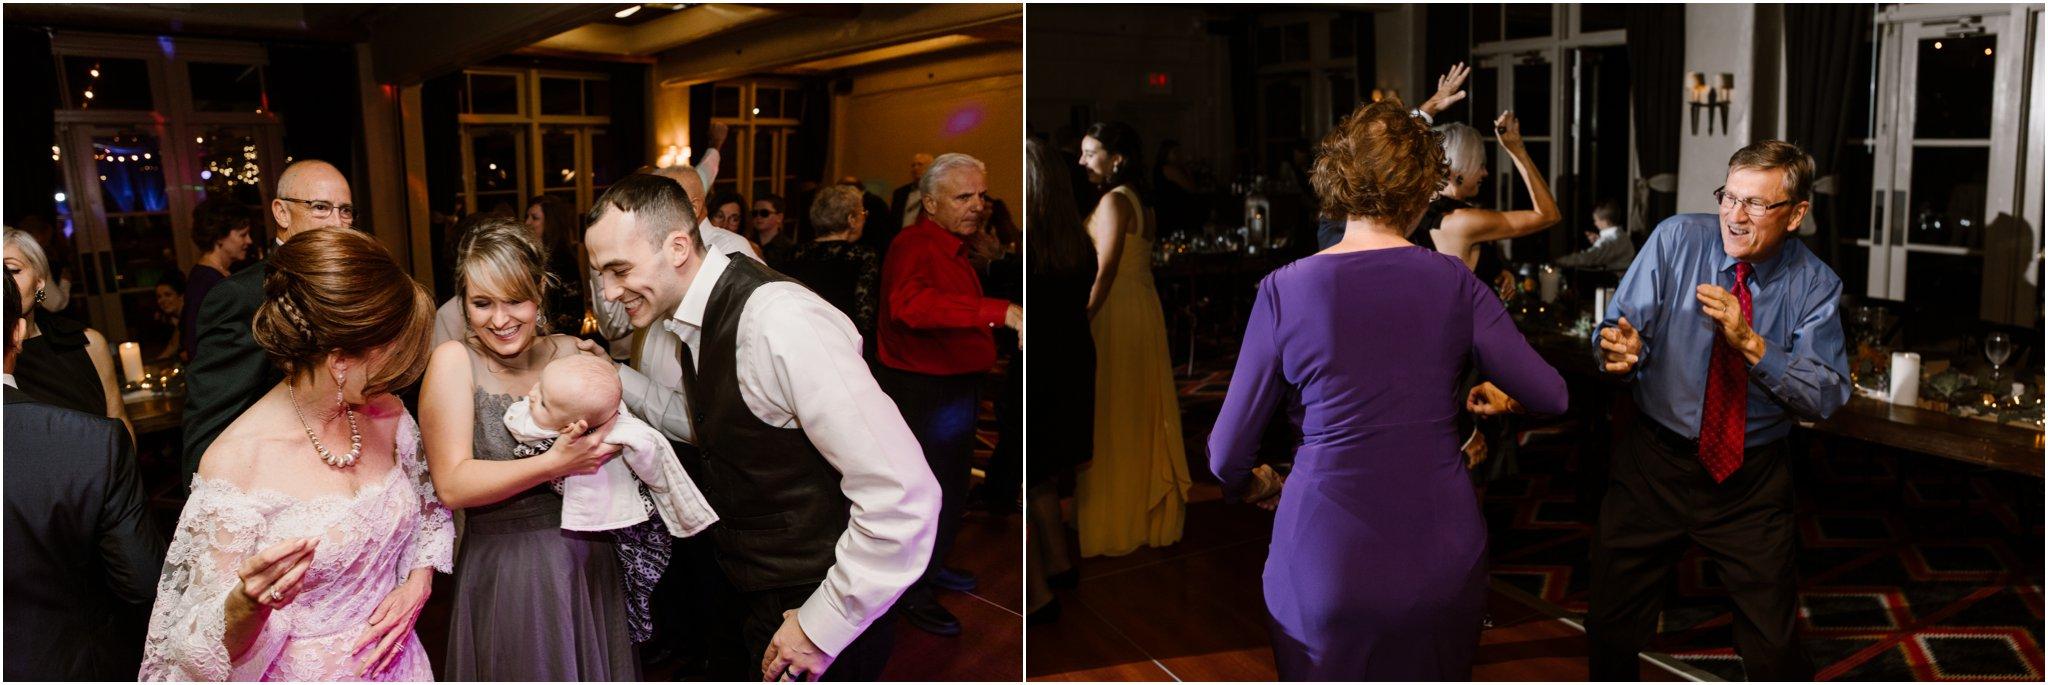 0052Santa Fe Wedding _Inn and Spa at Loretto Wedding, Inn and Spa at Loretto wedding, Santa Fe wedding photographers, blue rose photography